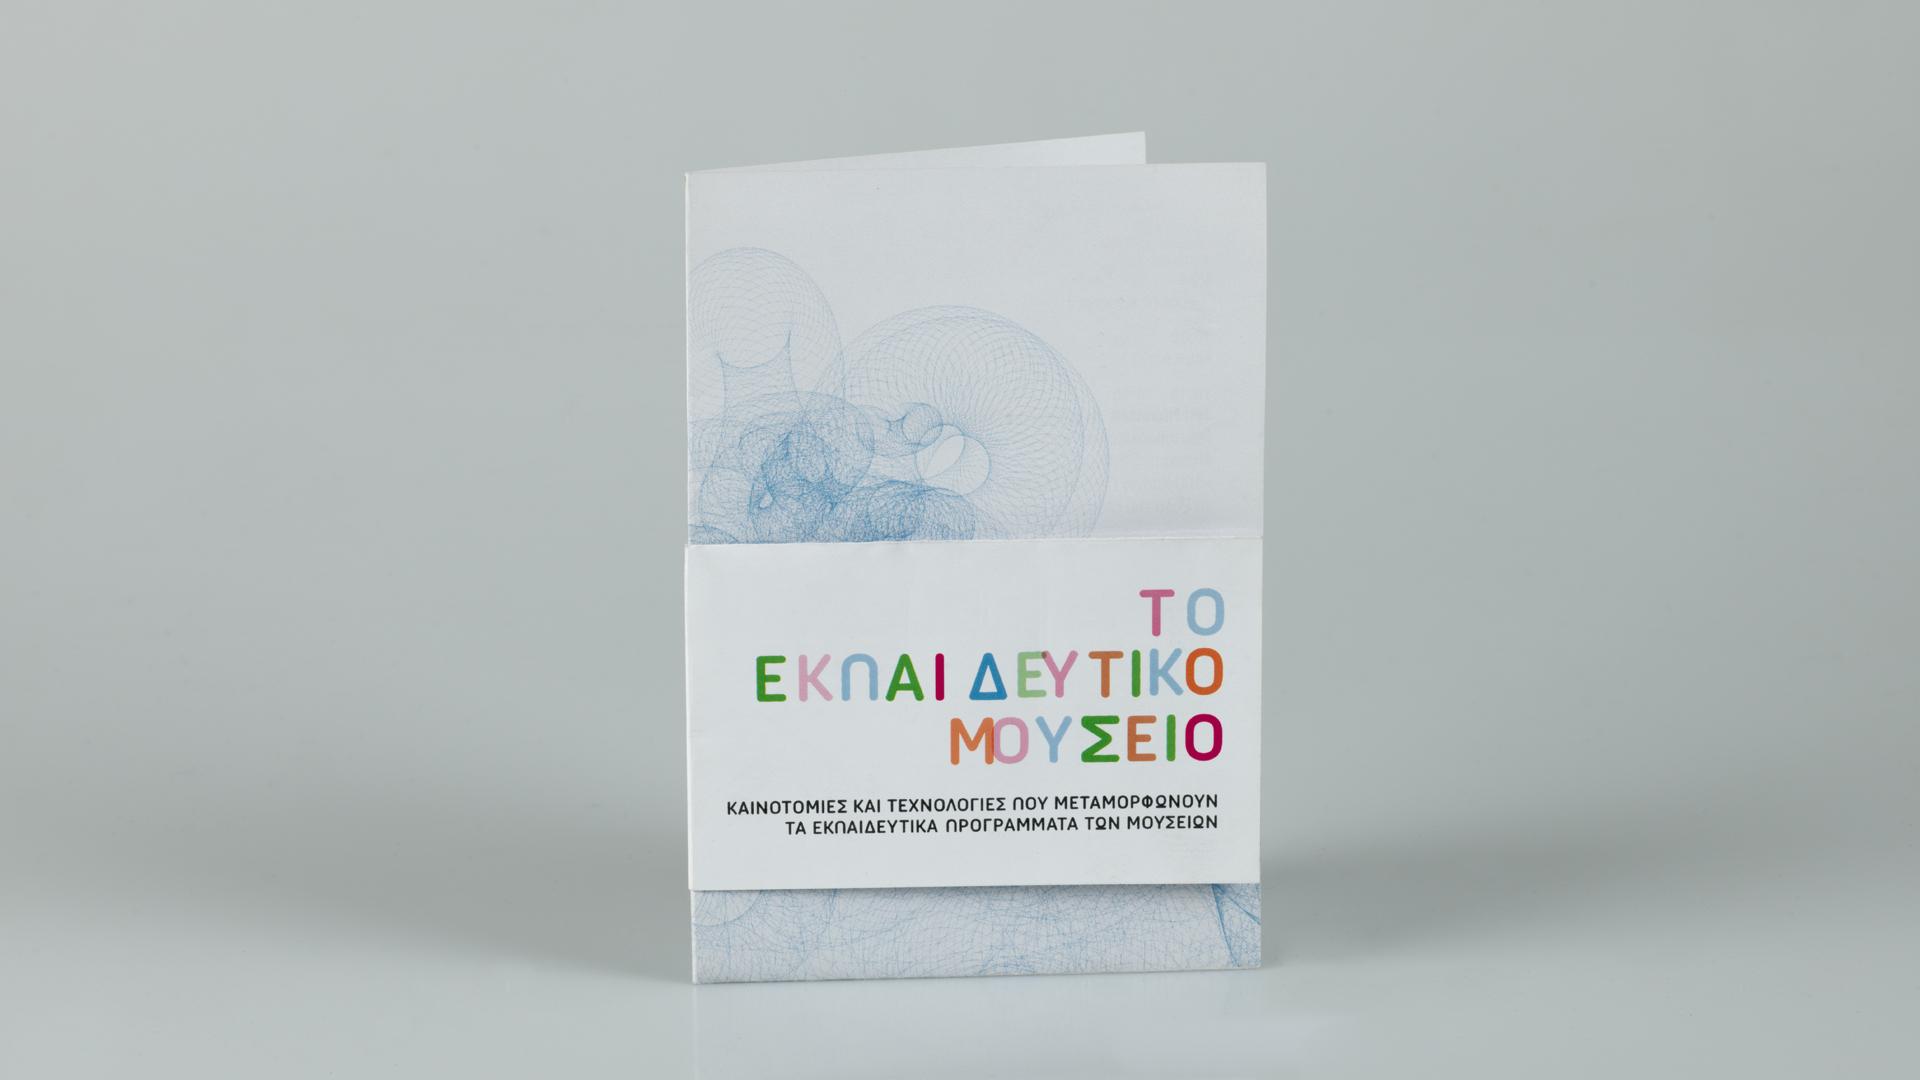 designpark_benaki_leaflet